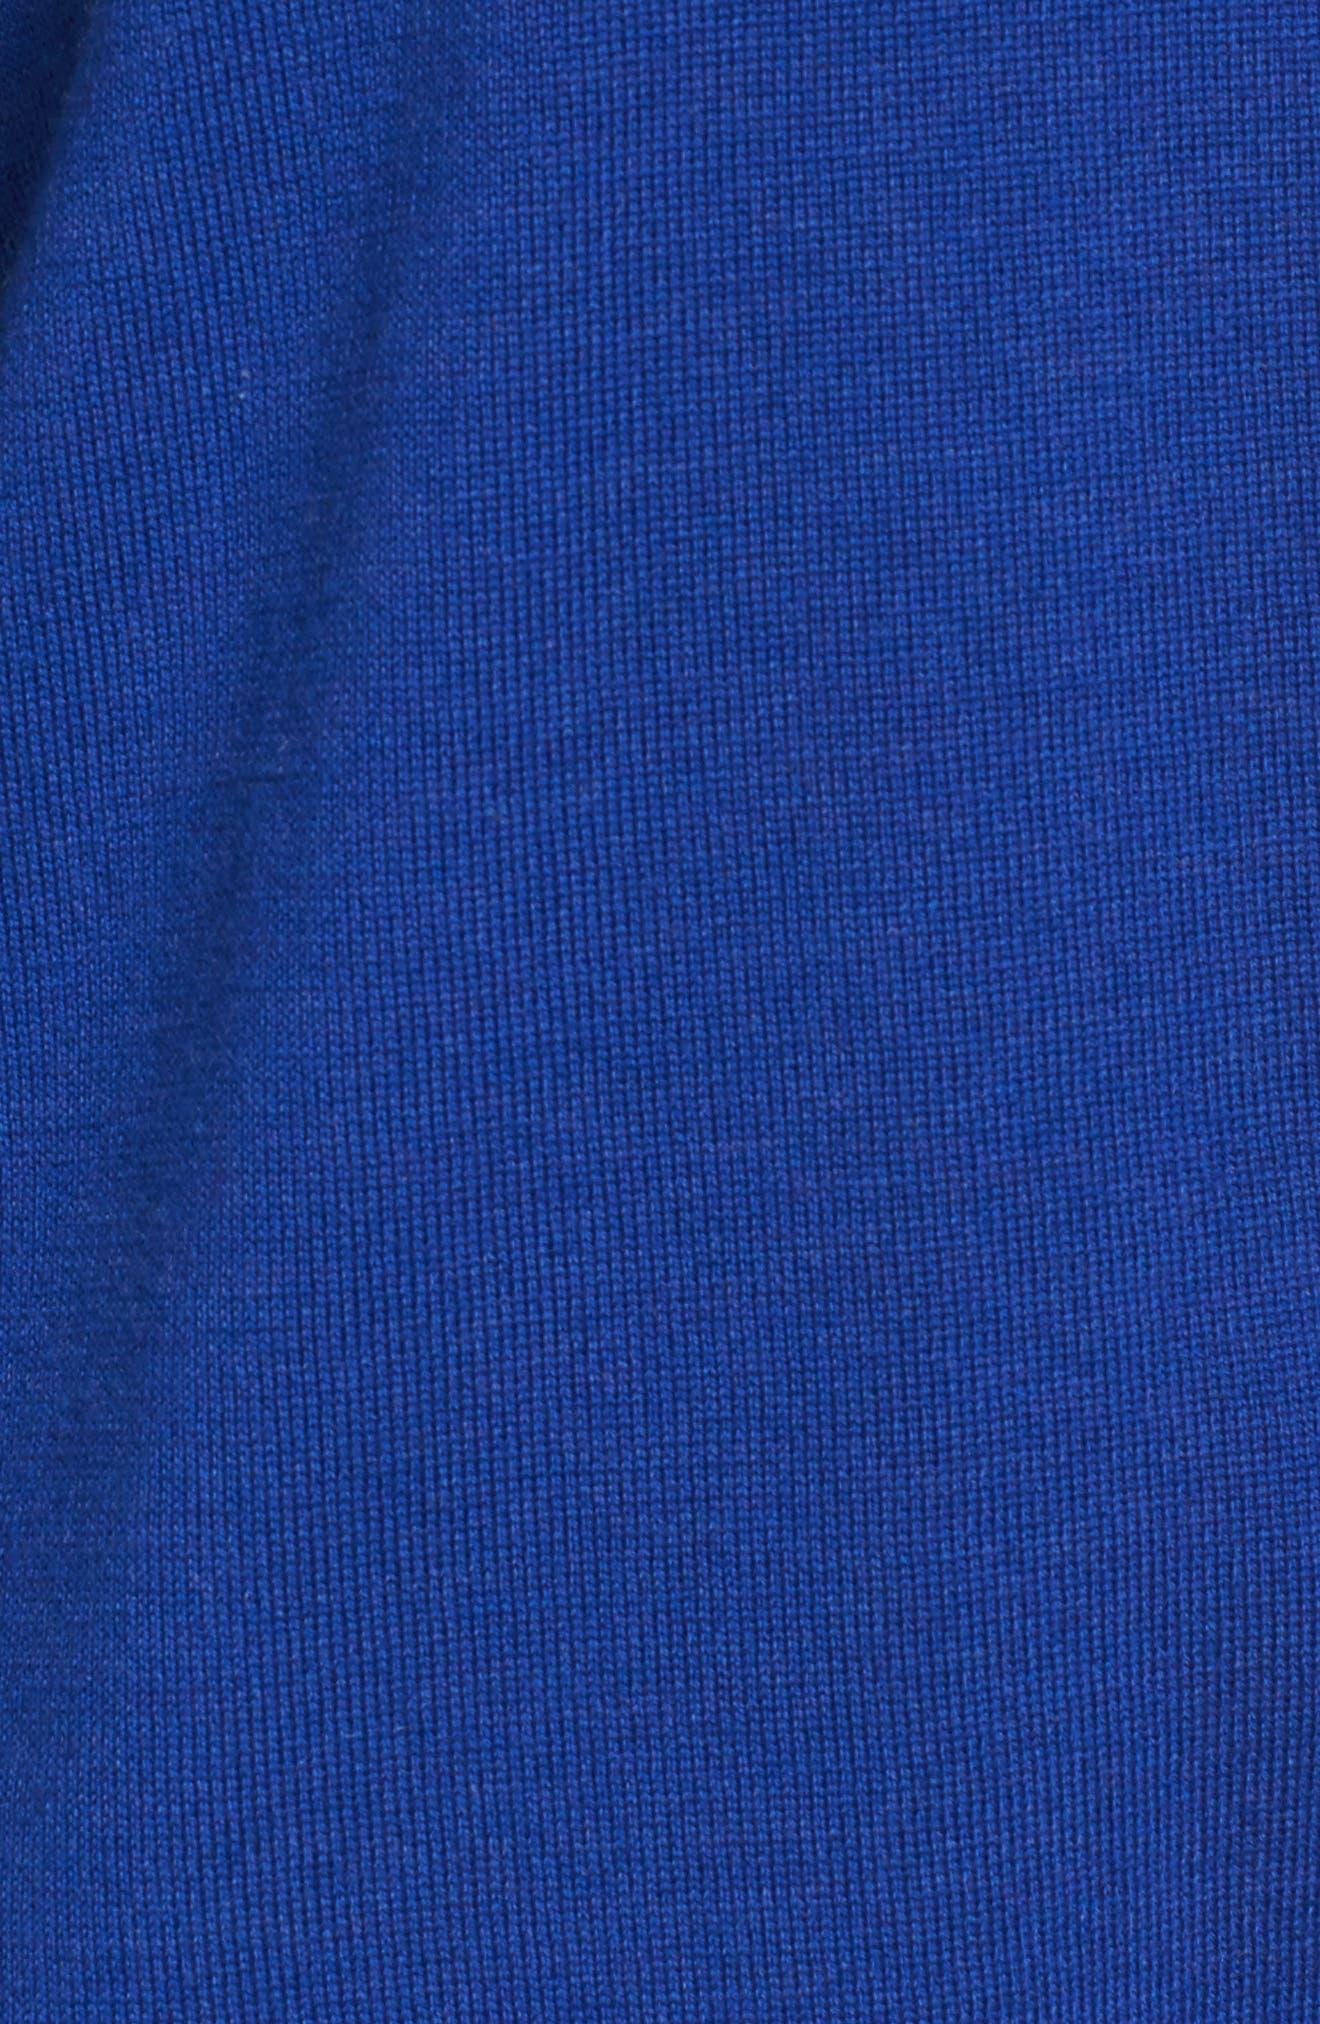 Merino Wool Boxy Turtleneck Sweater,                             Alternate thumbnail 28, color,